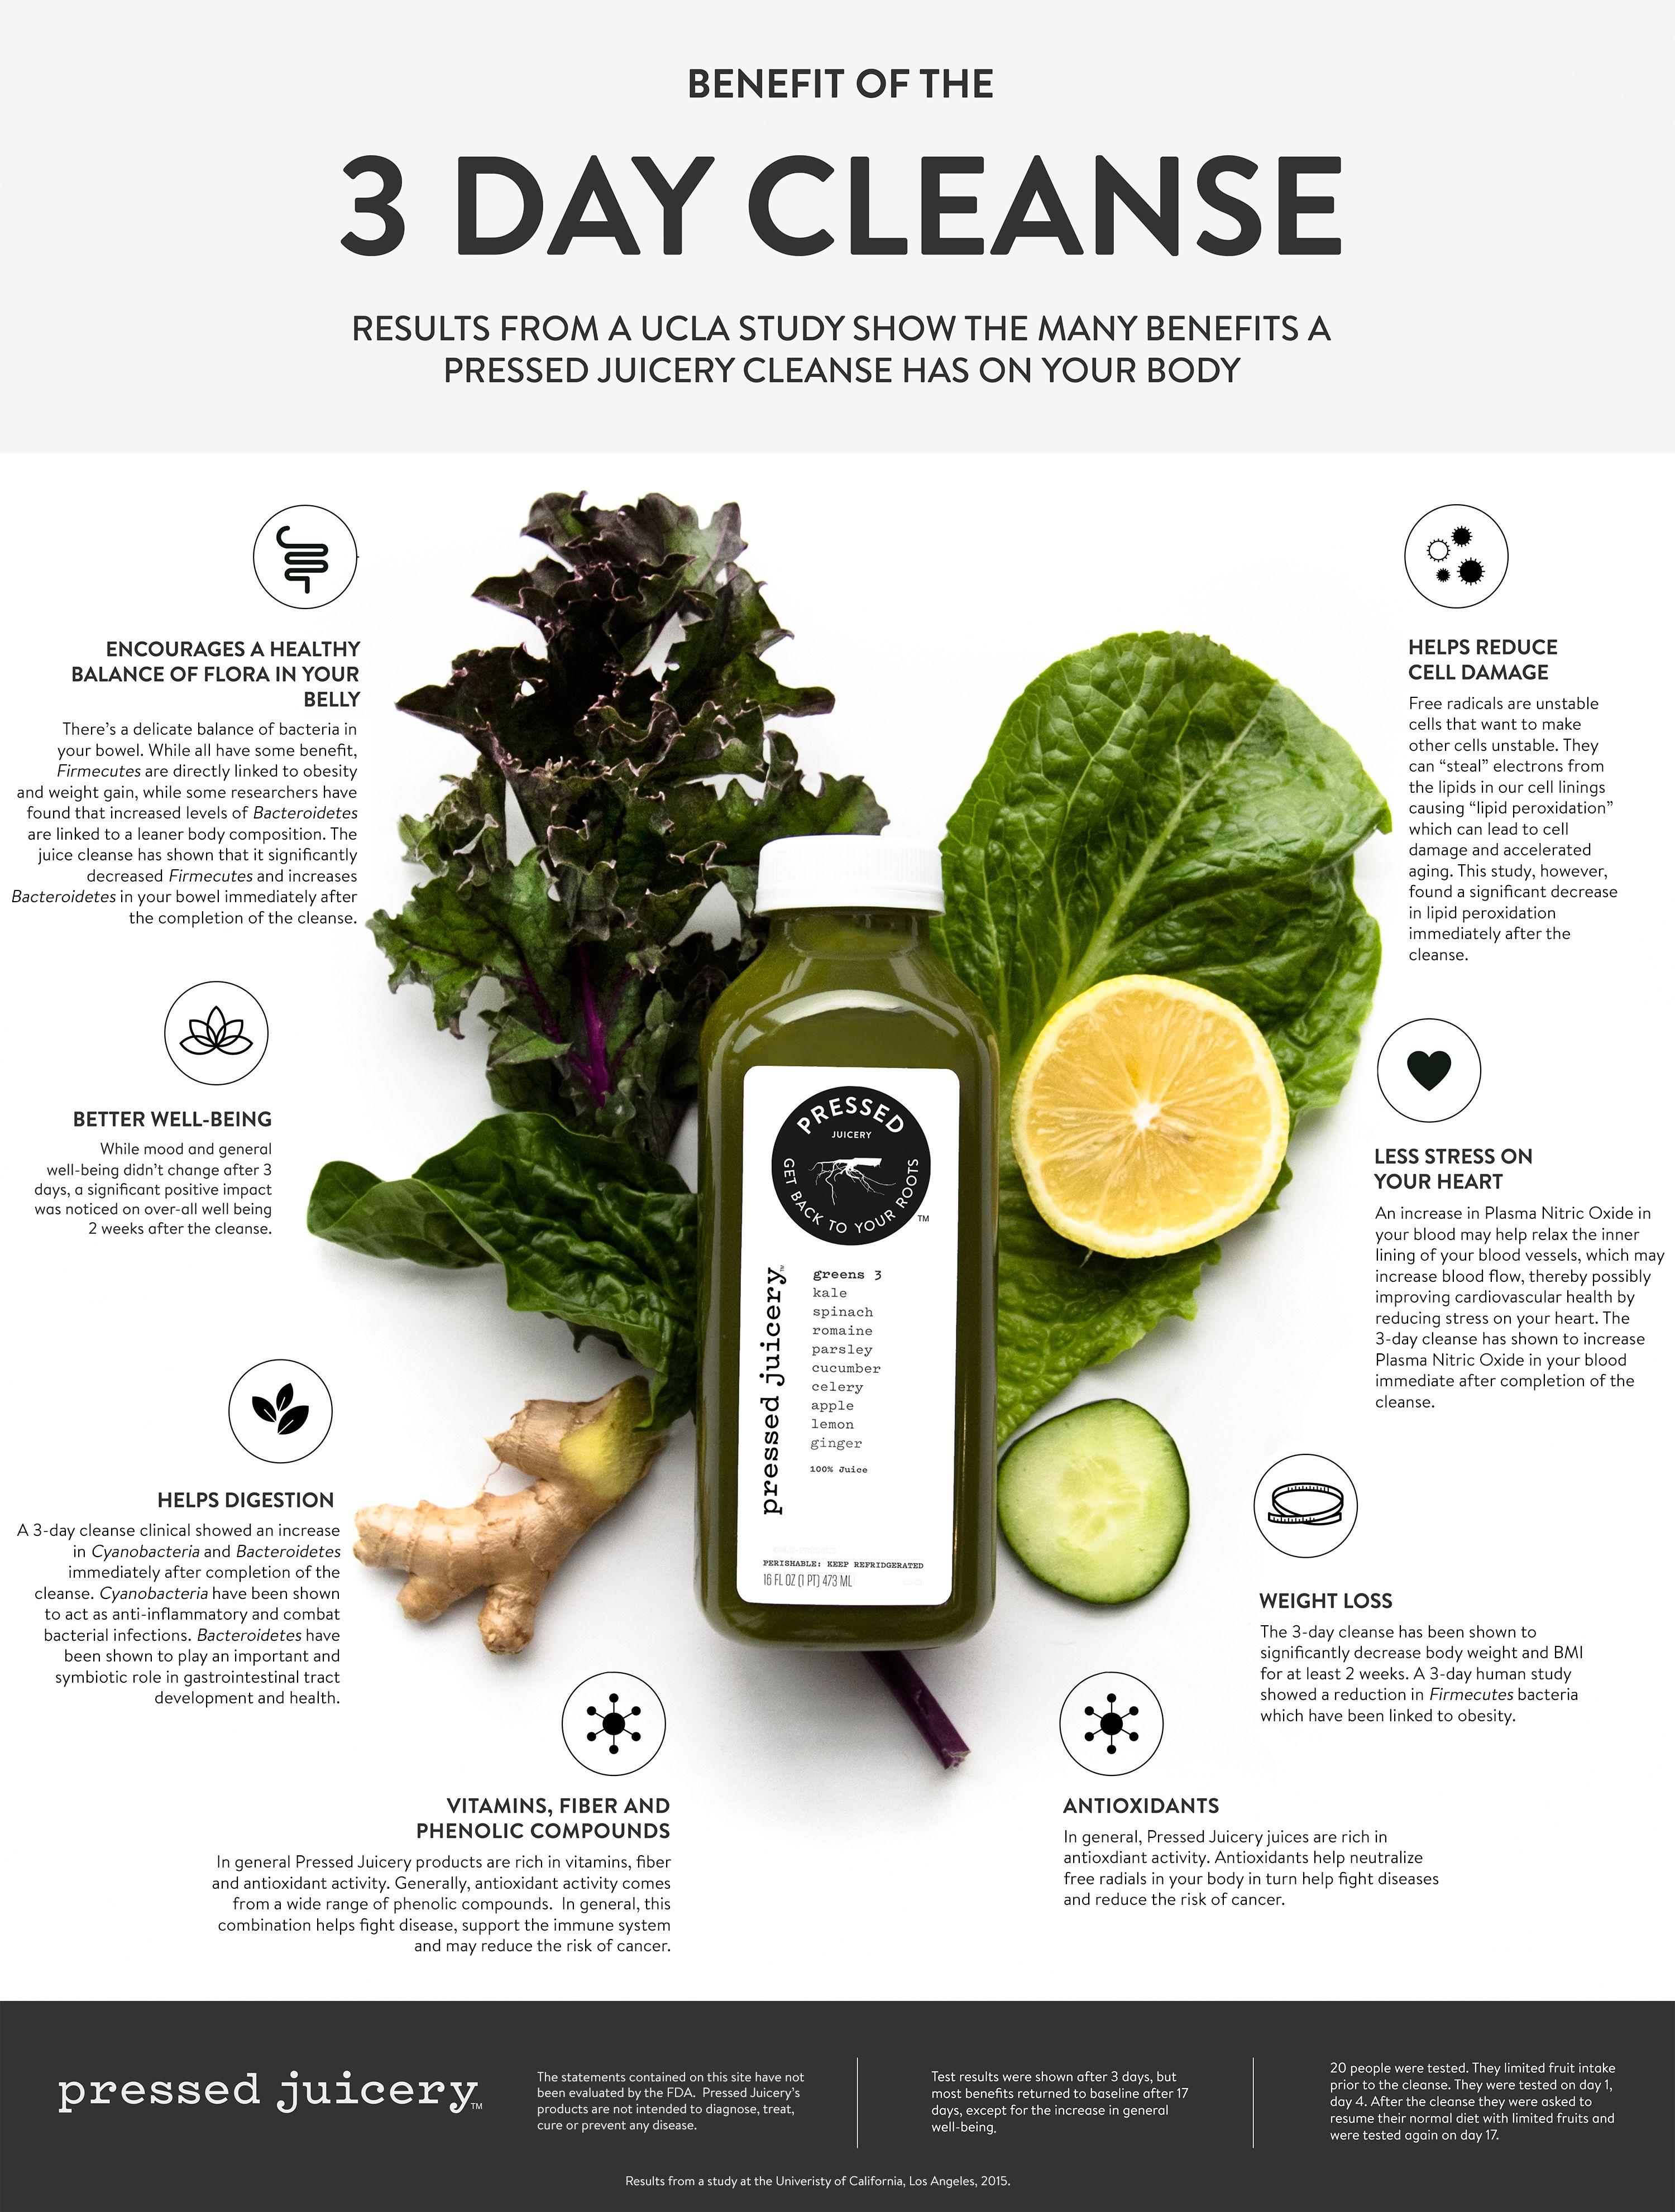 benefits of juice cleanse | pressed juicery | juice cleanse